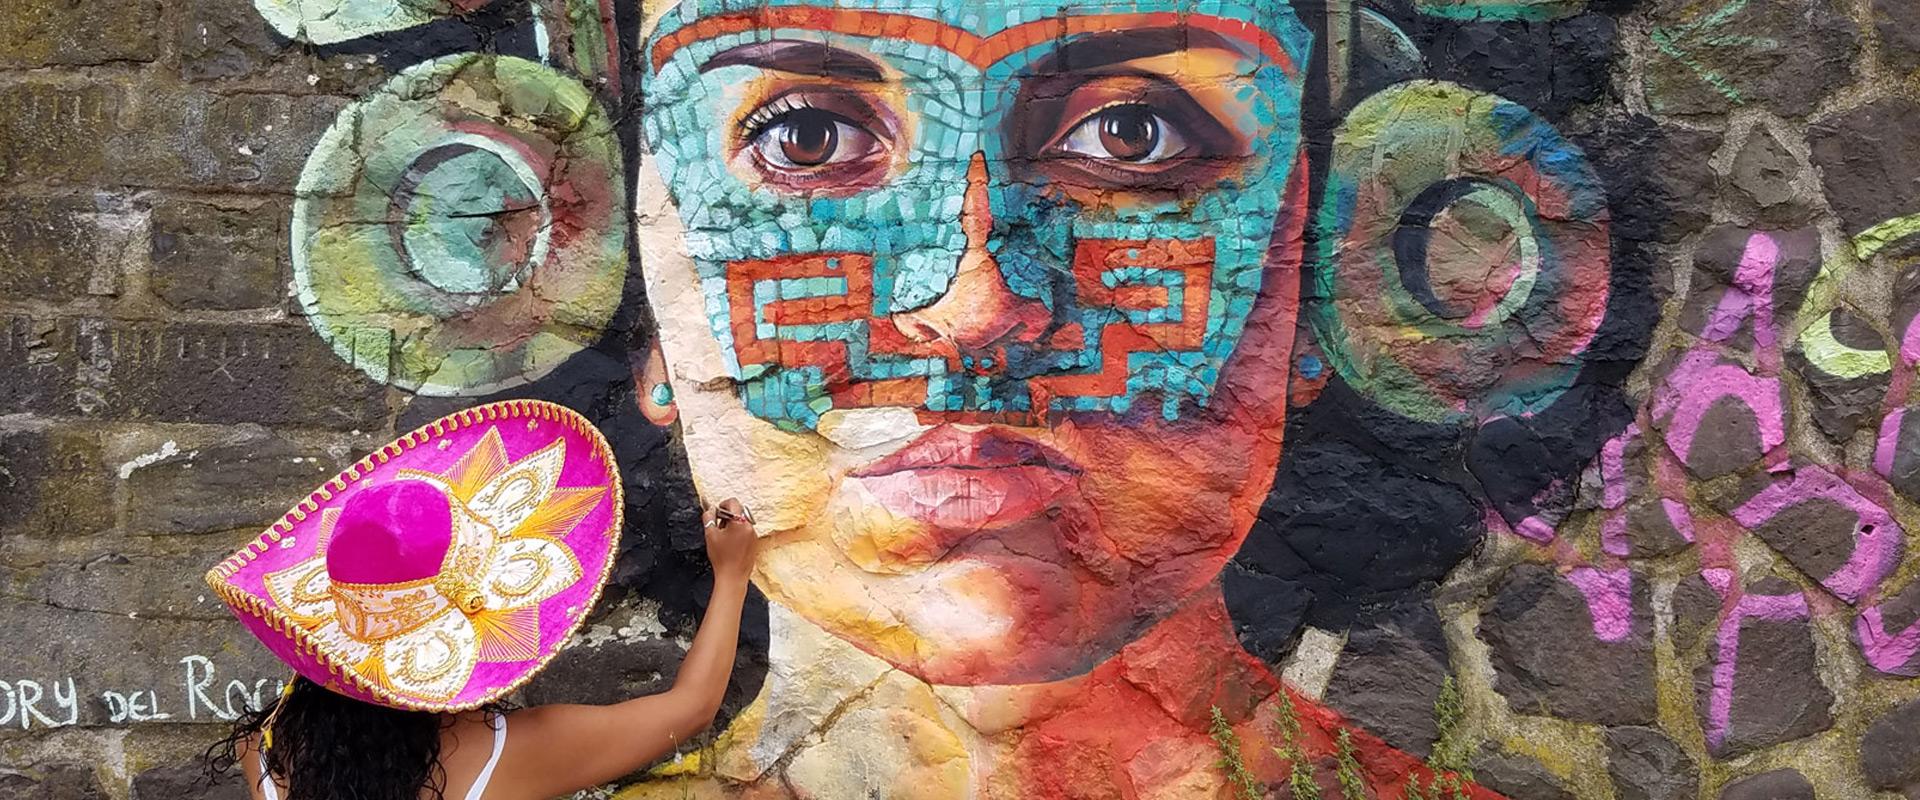 Art in Haut Bugey Festival Street Art - Graines de l'Ain